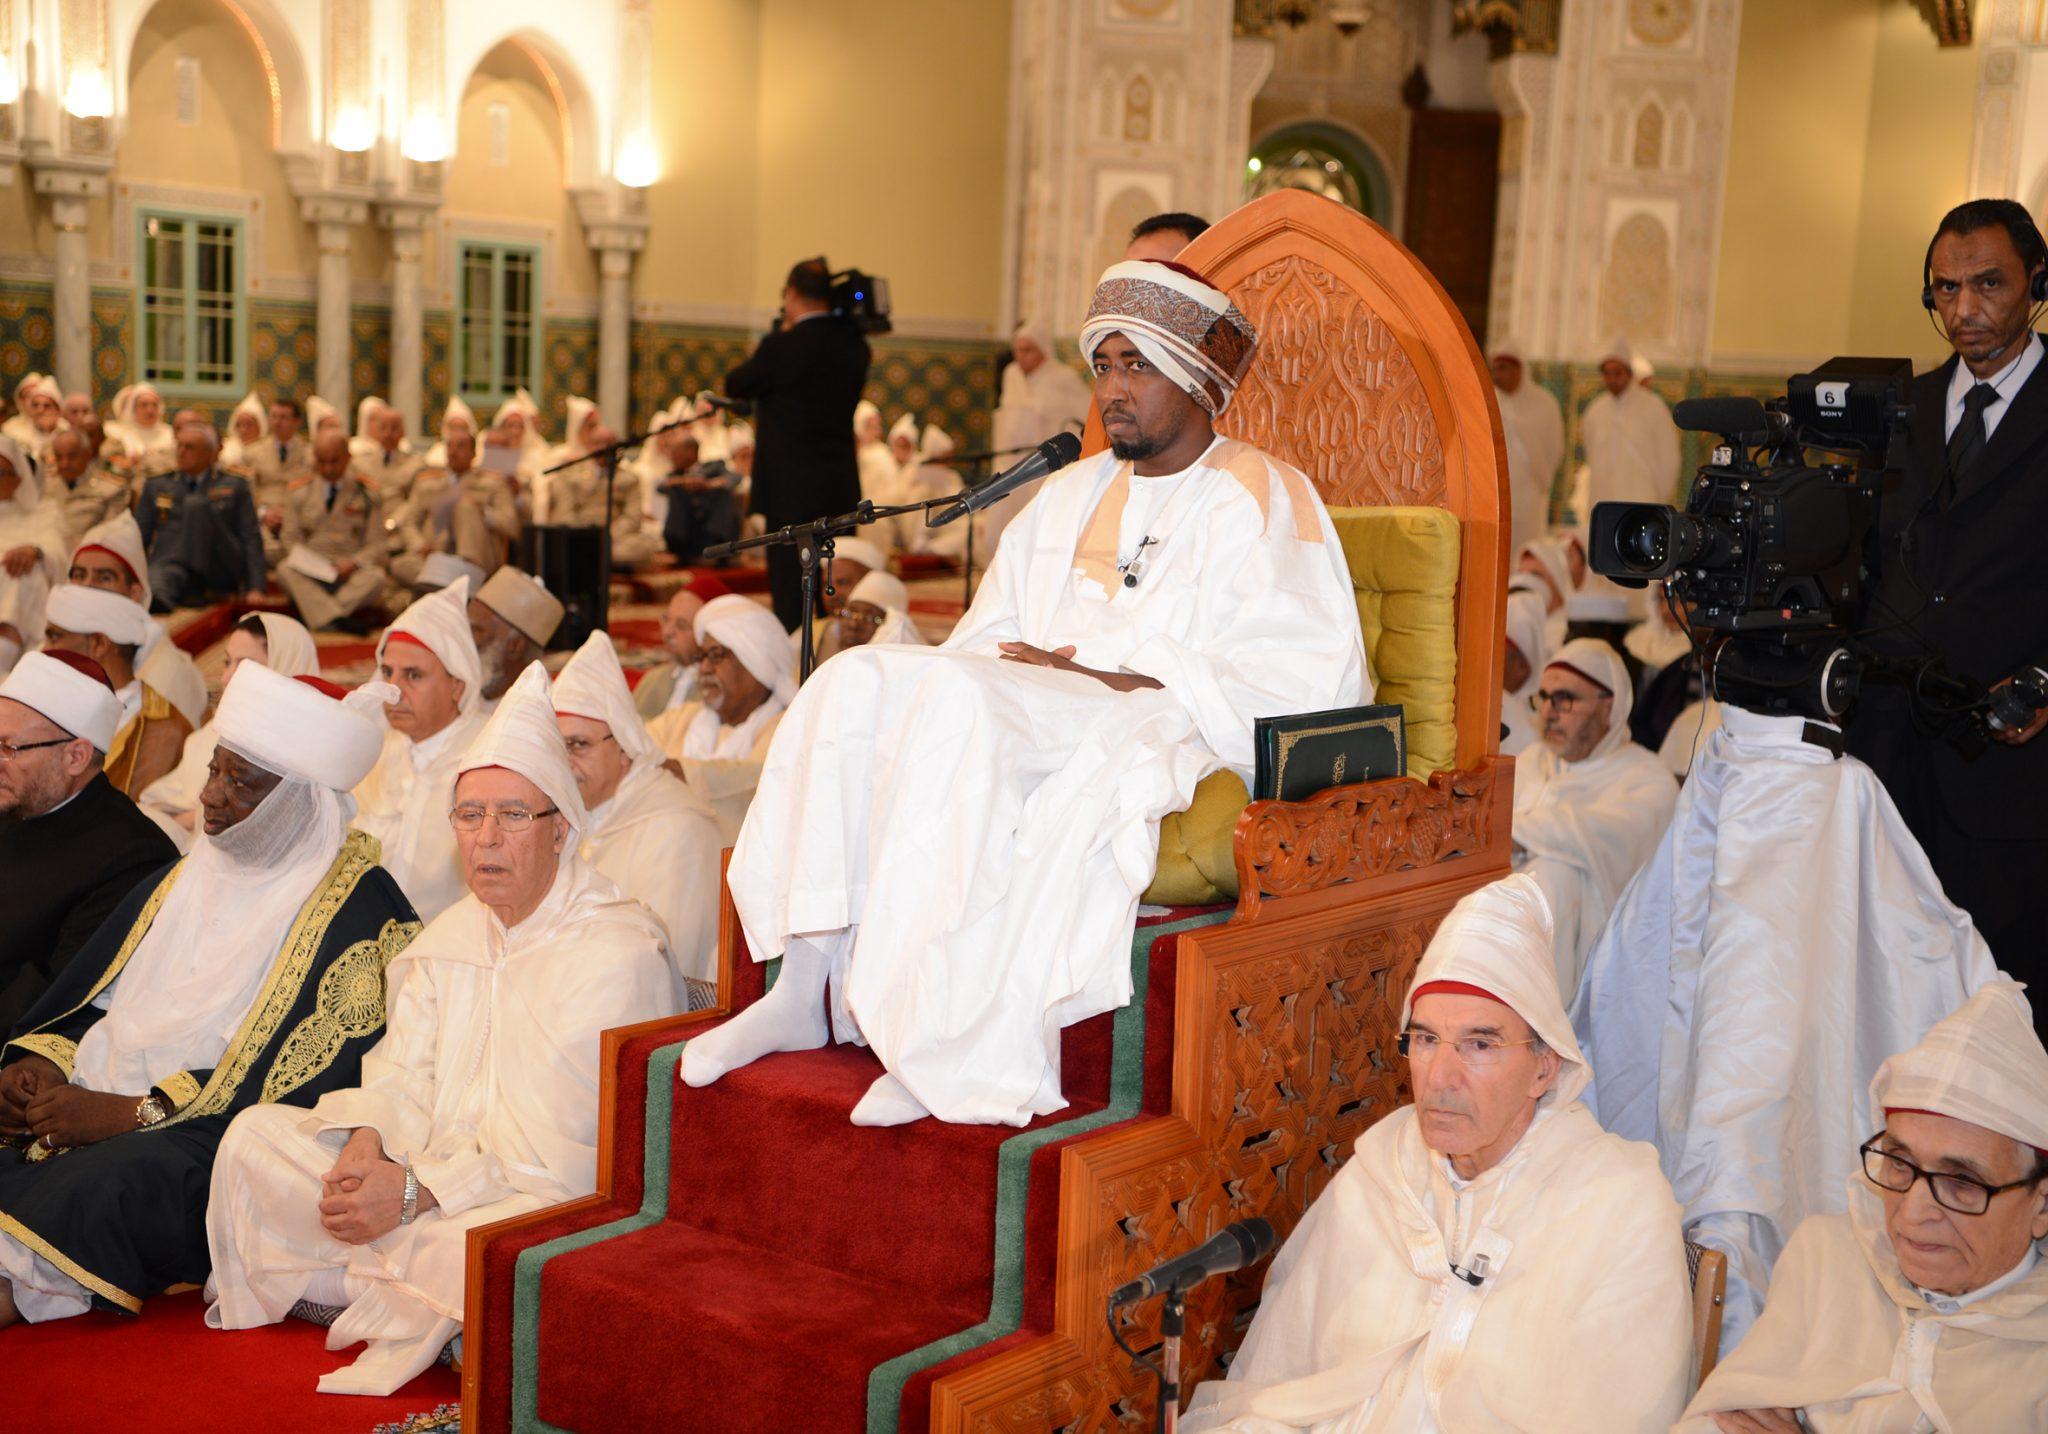 Dahir Establishing Mohammed VI Foundation of African Oulema